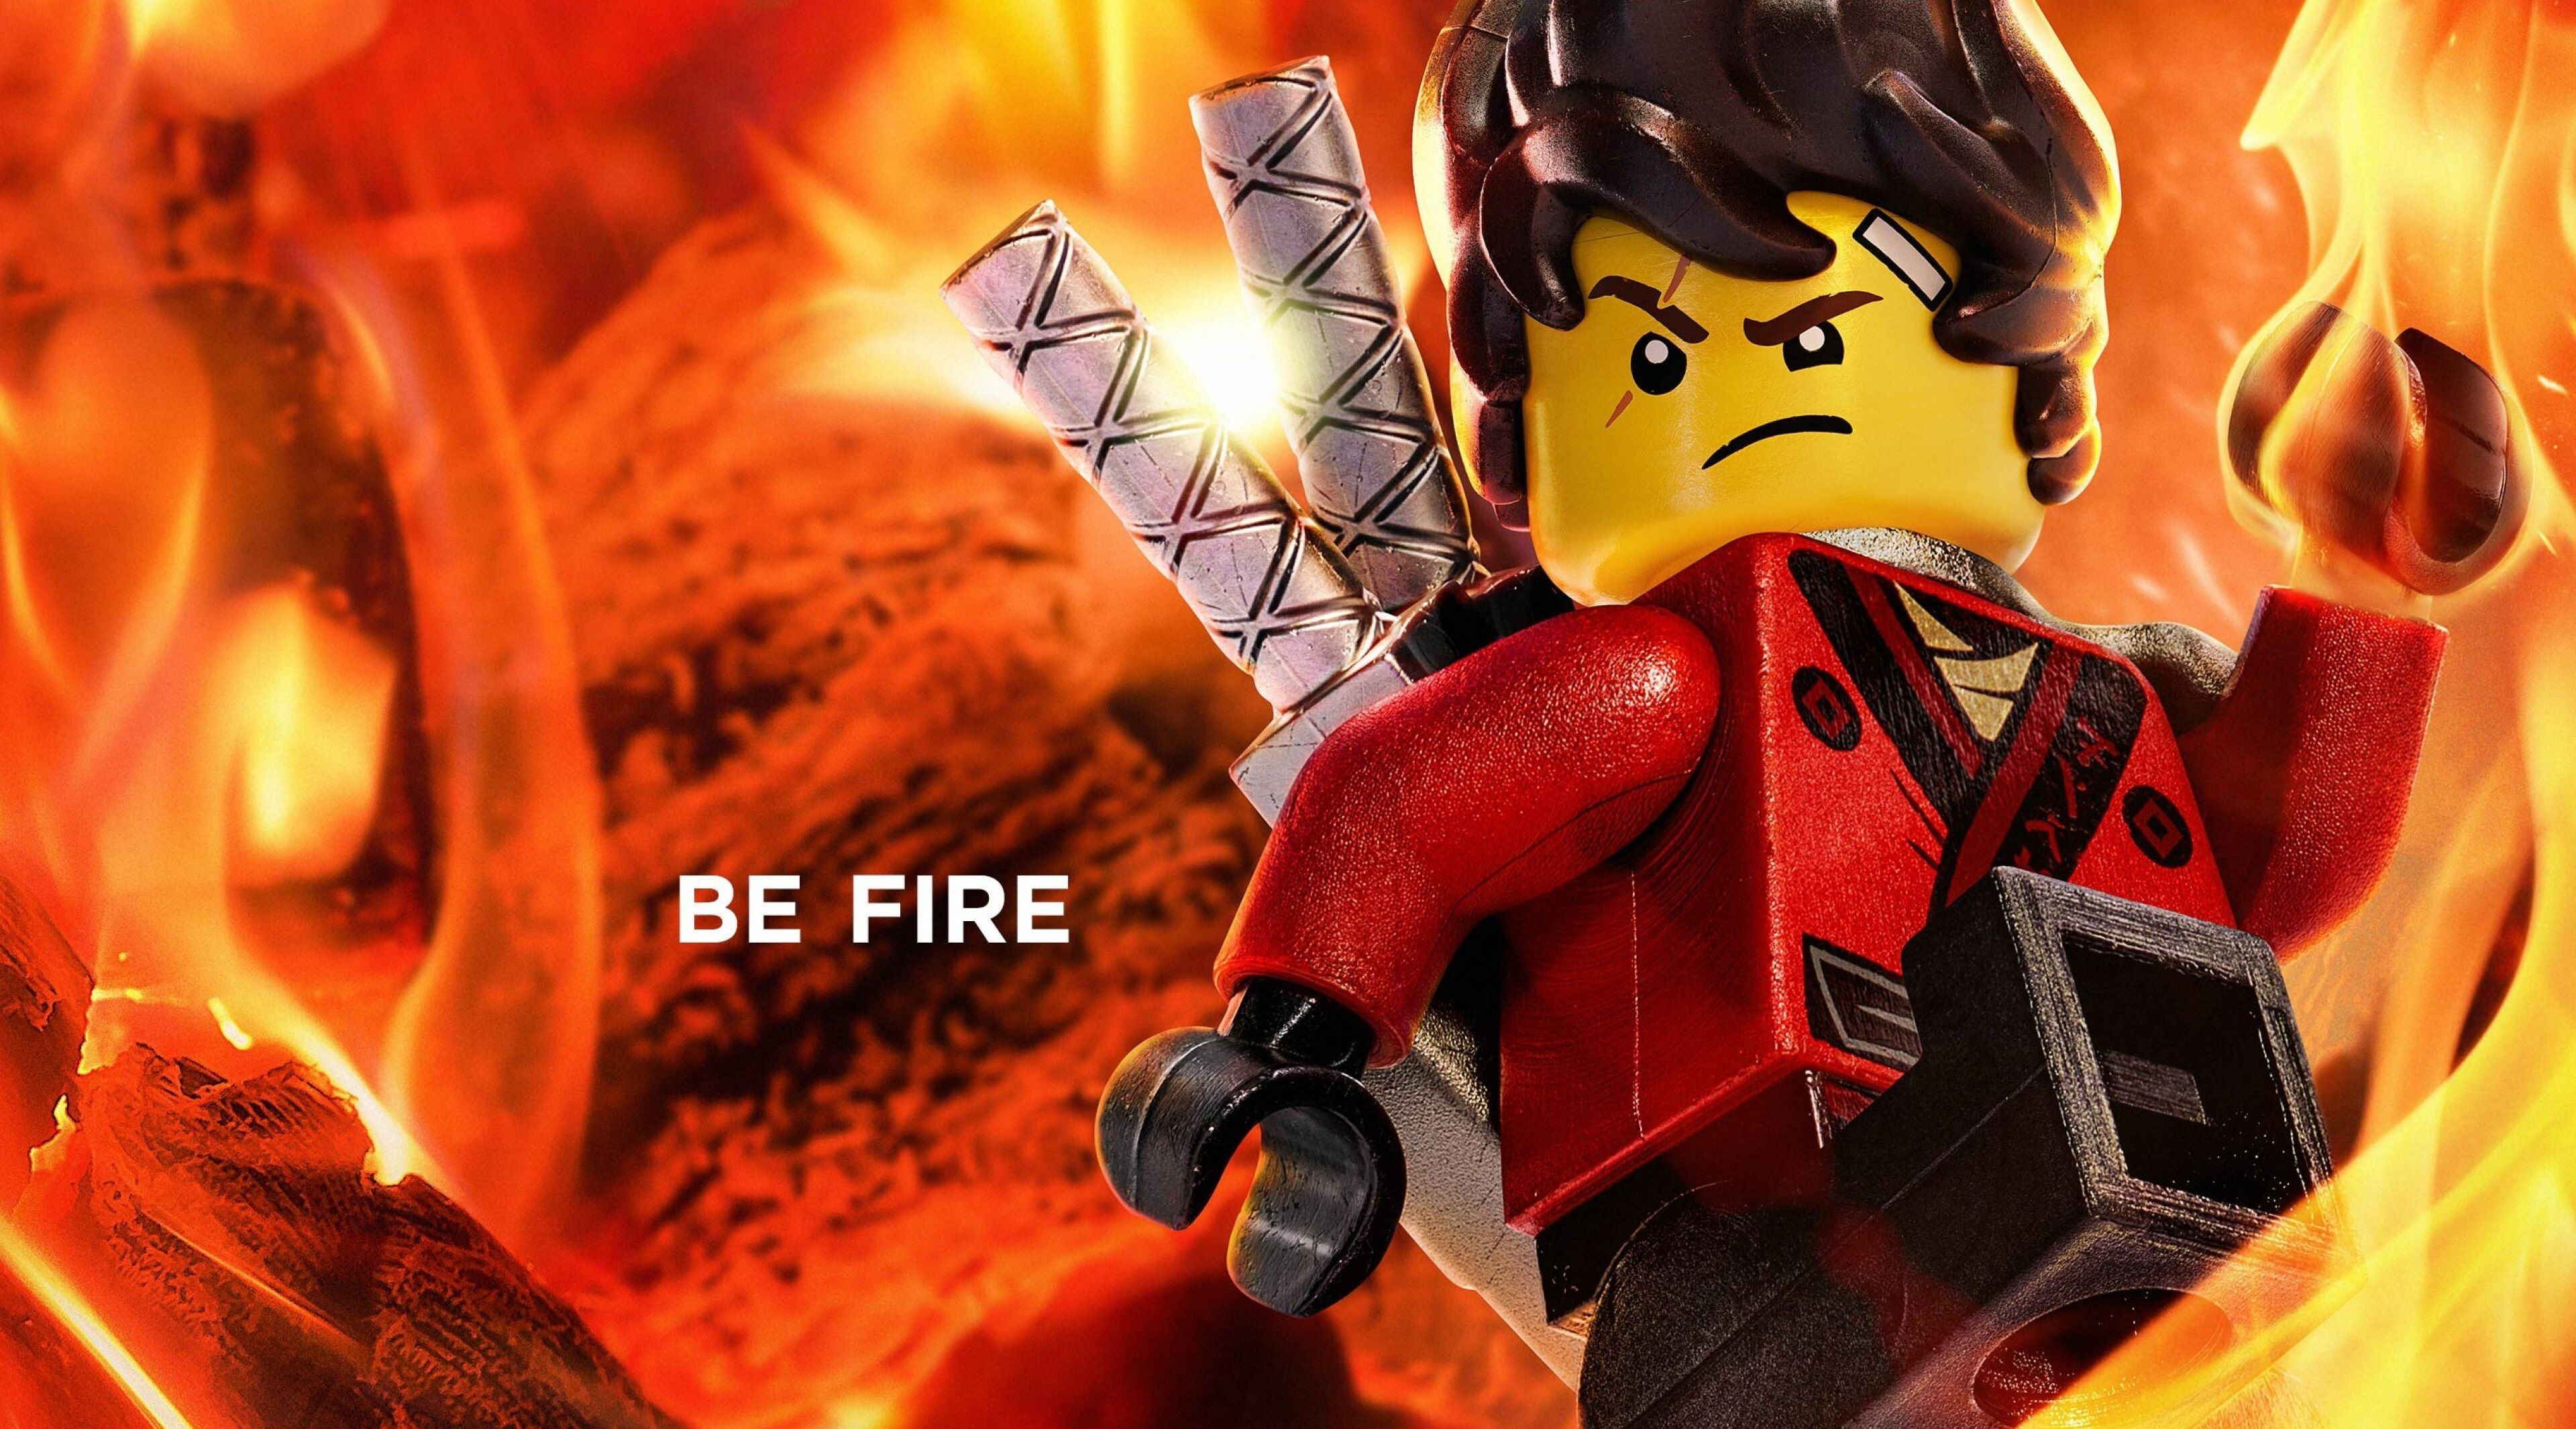 3840x2130 The Lego Ninjago Movie 4k Free Download Wallpaper In Hd Lego Ninjago Movie Lego Ninjago Ninjago